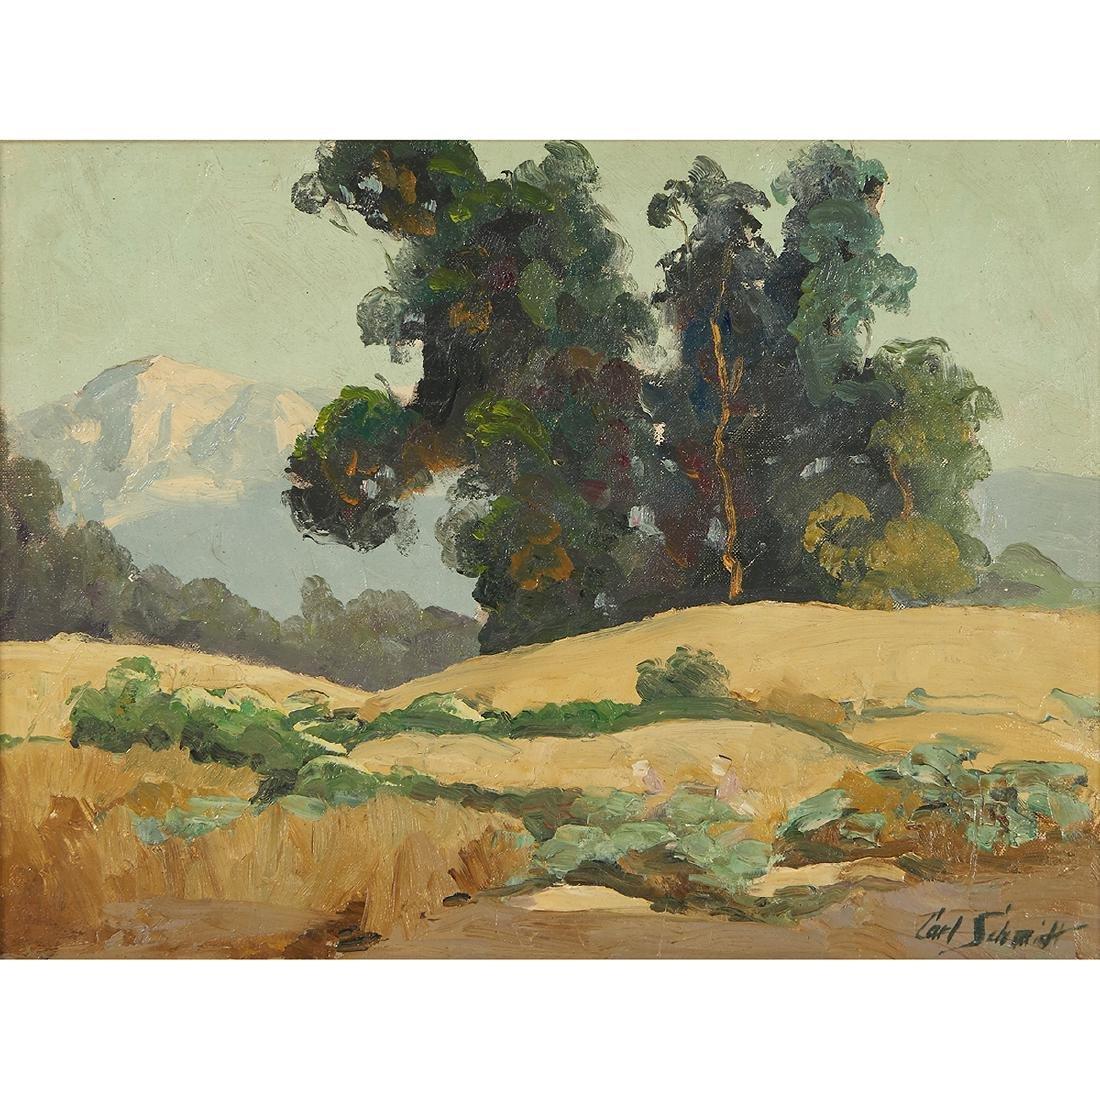 Carl Schmidt, Landscape